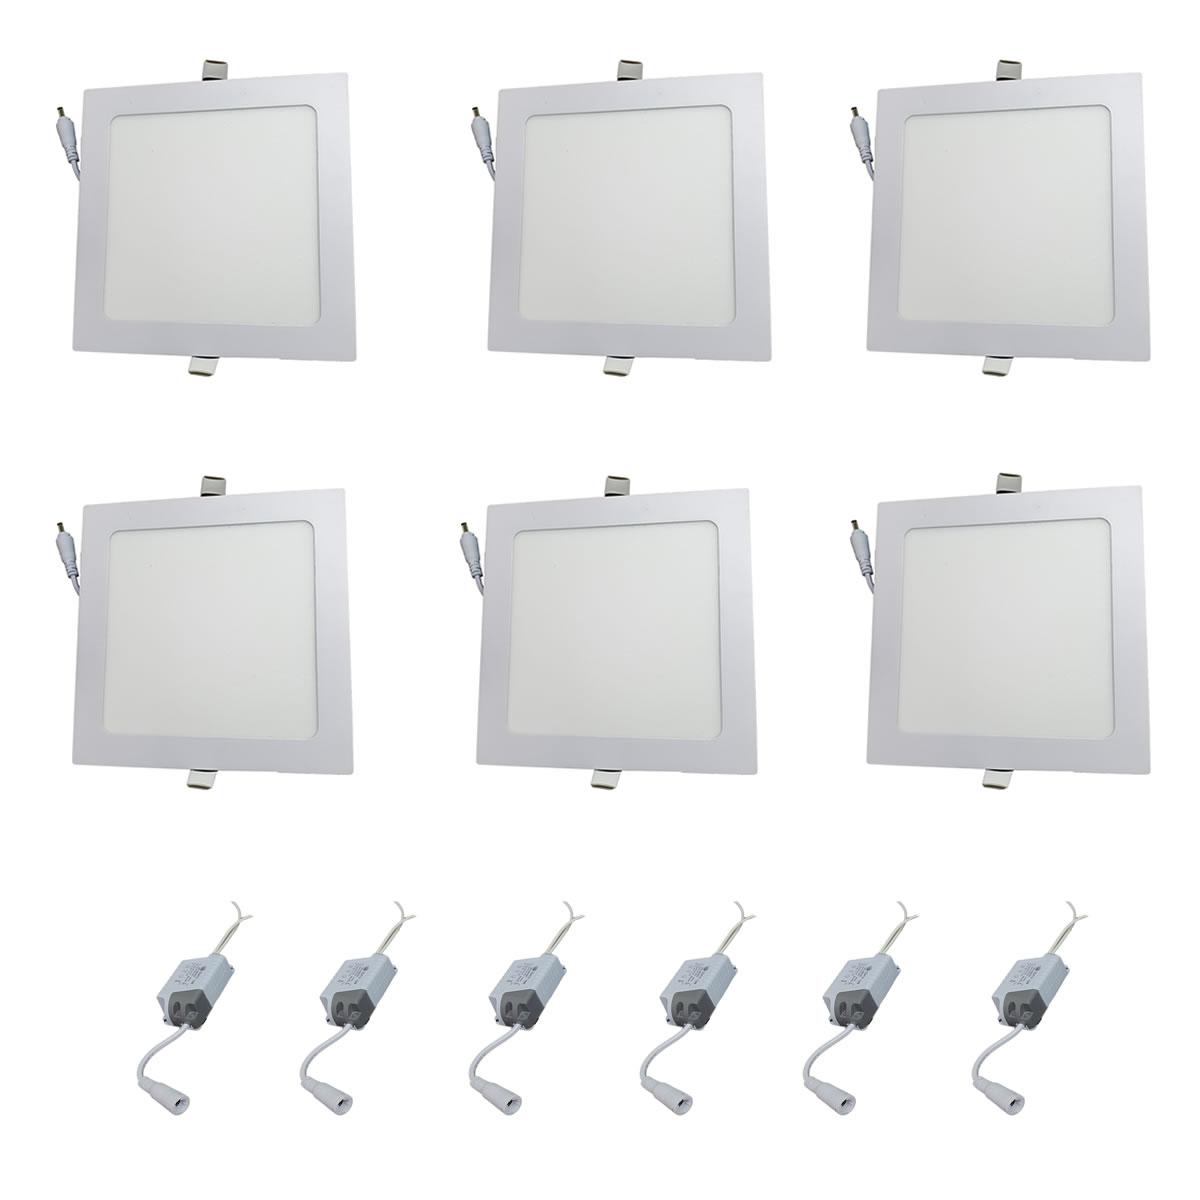 Kit 6 Luminárias LED Embutir 12w Quadrada Branco Frio 6500k Plafon